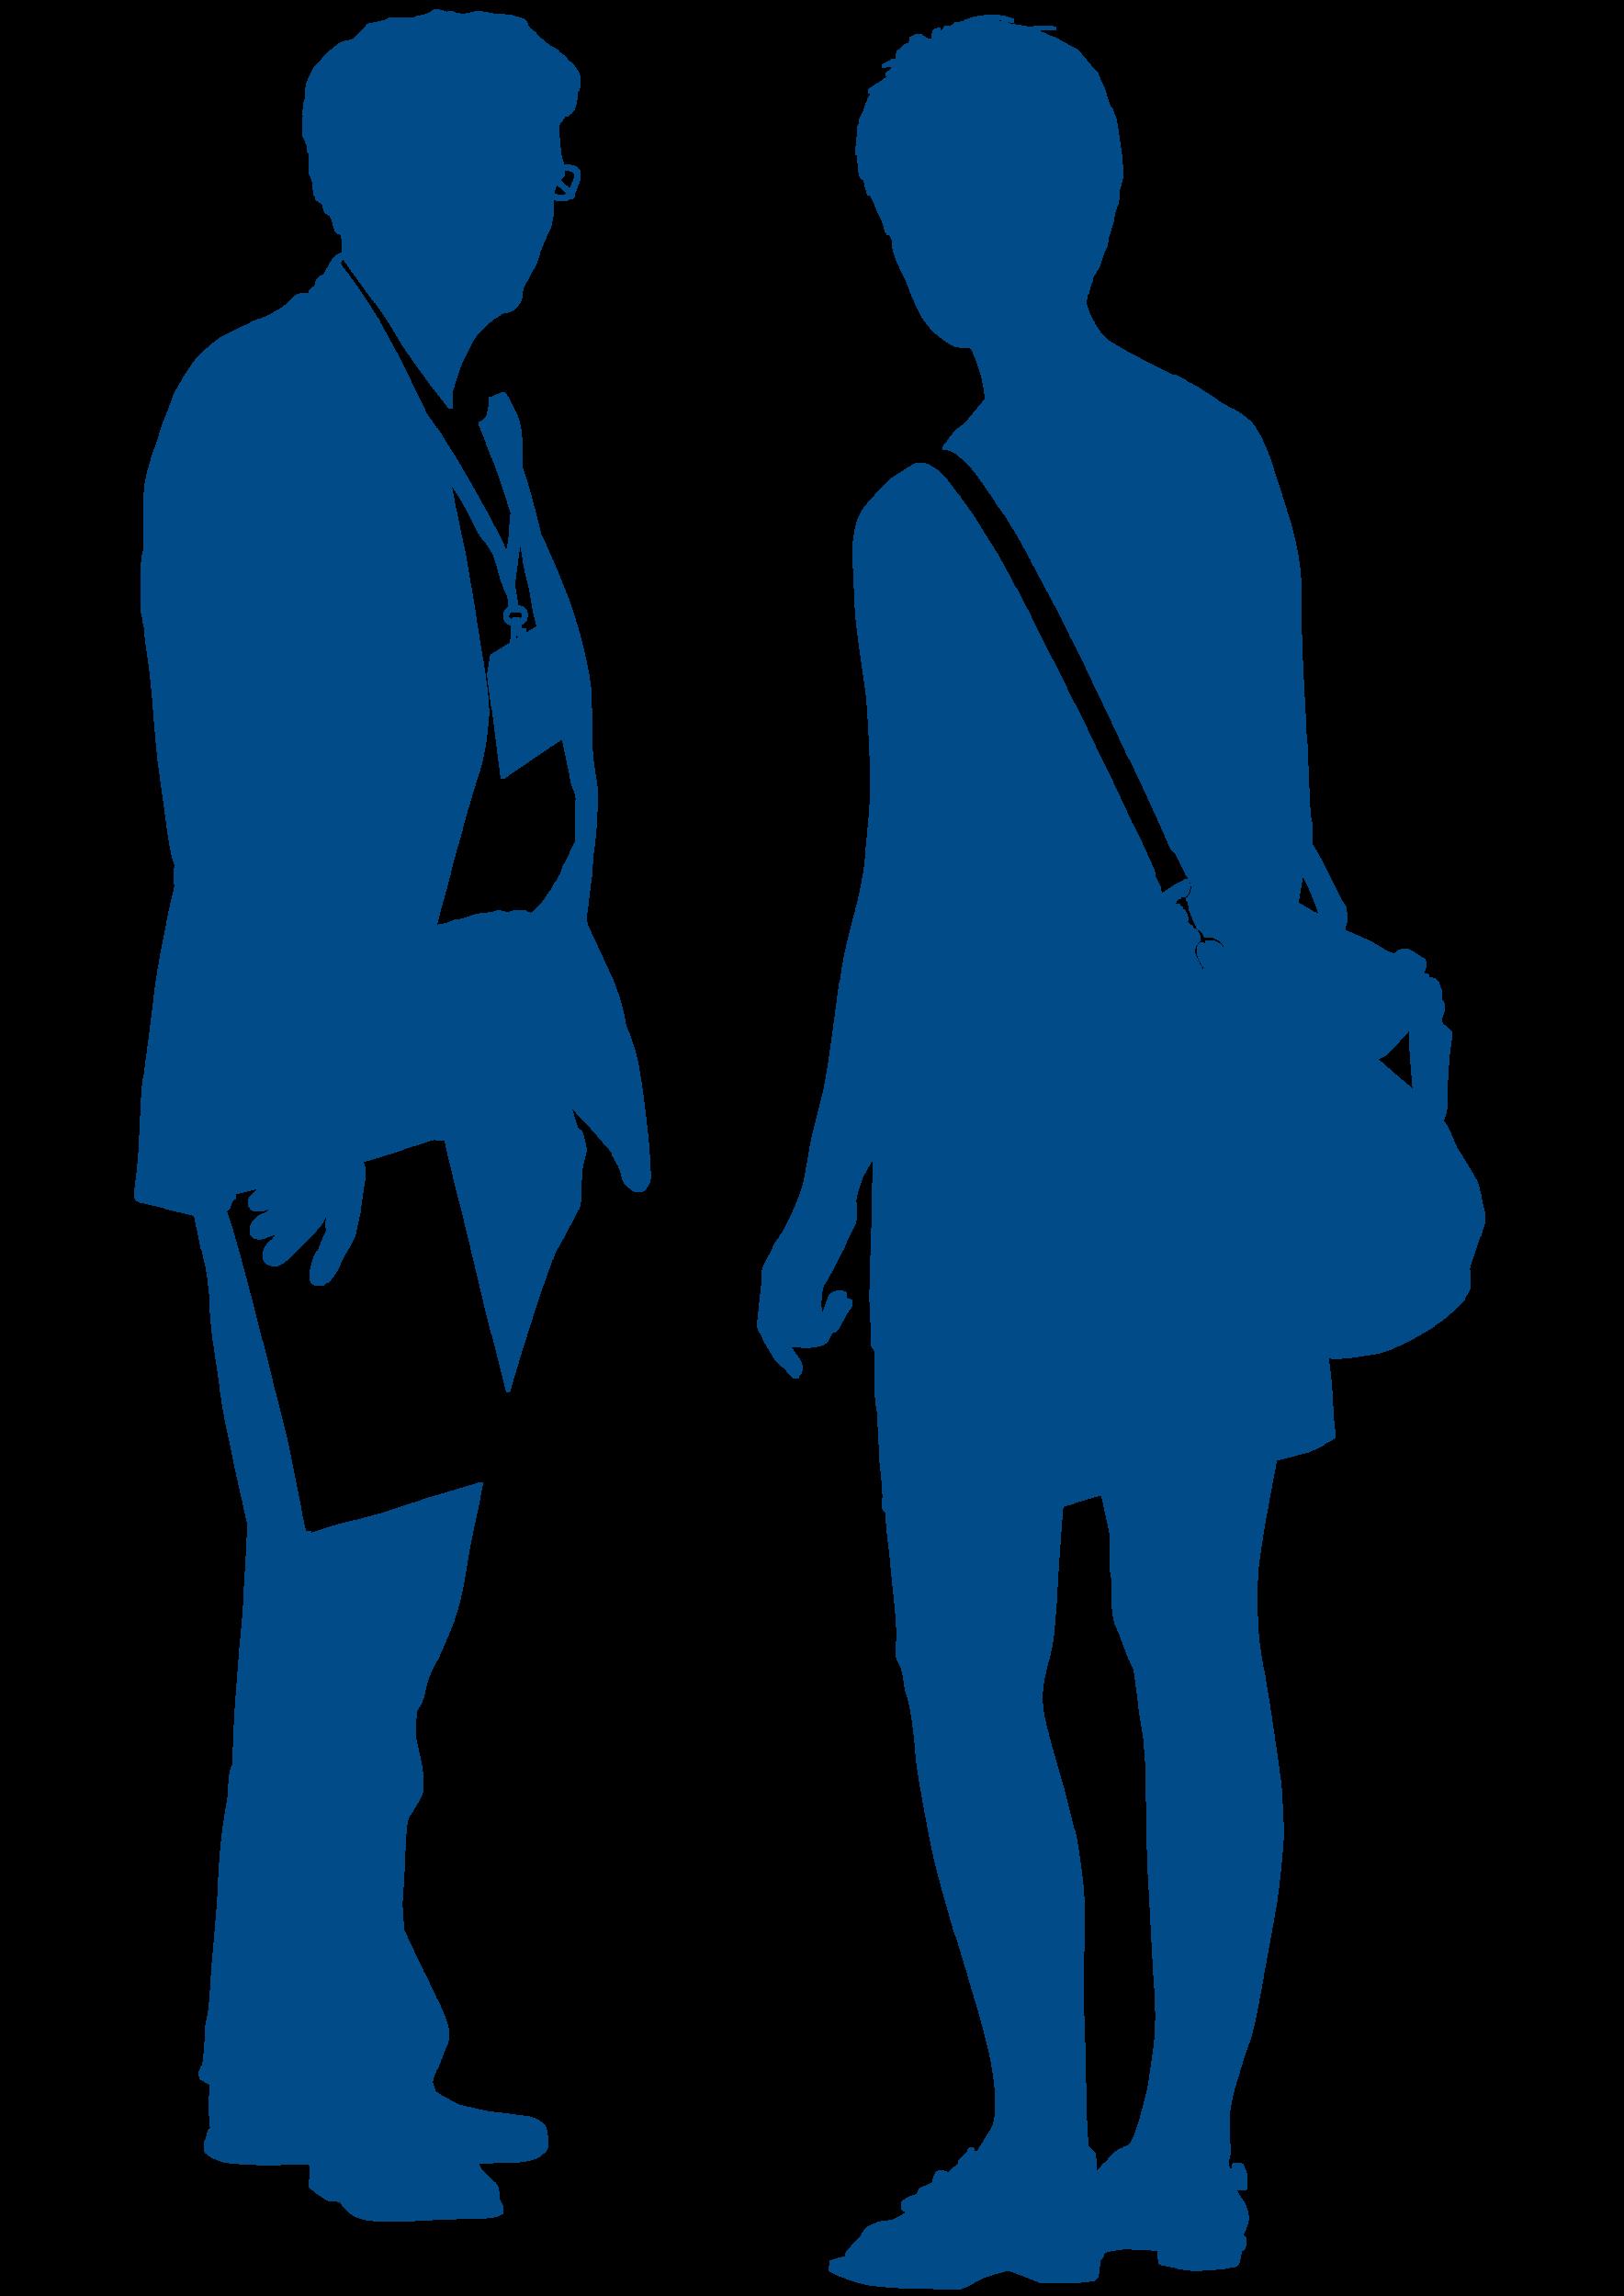 adviser_with_client_4_heritageblue